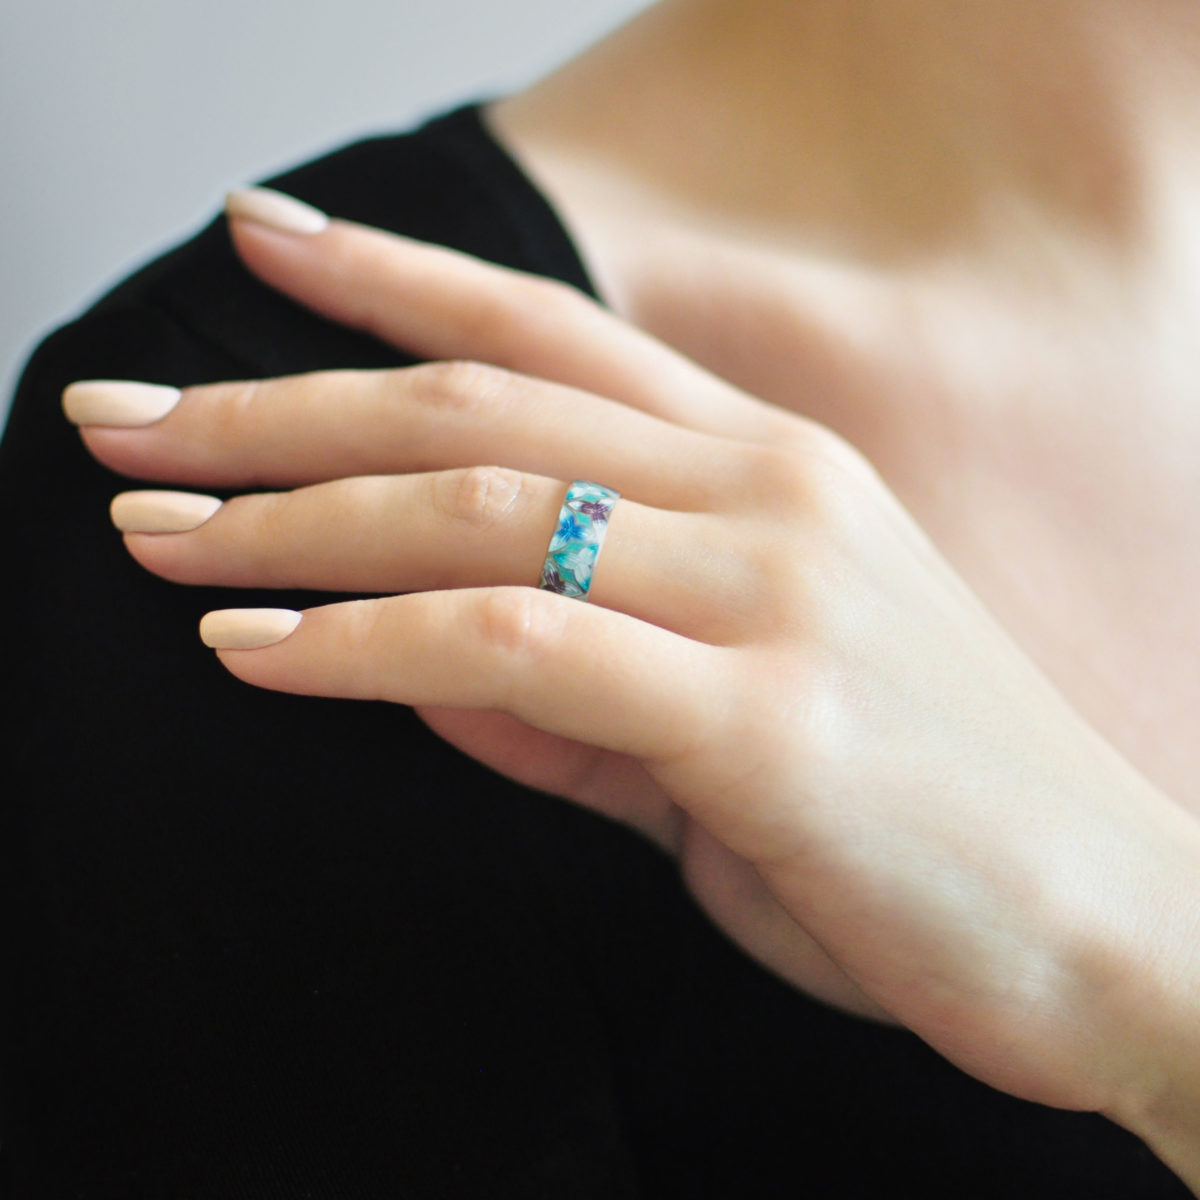 Serebro golubaya1 1200x1200 - Кольцо из серебра «Трилистник», голубая